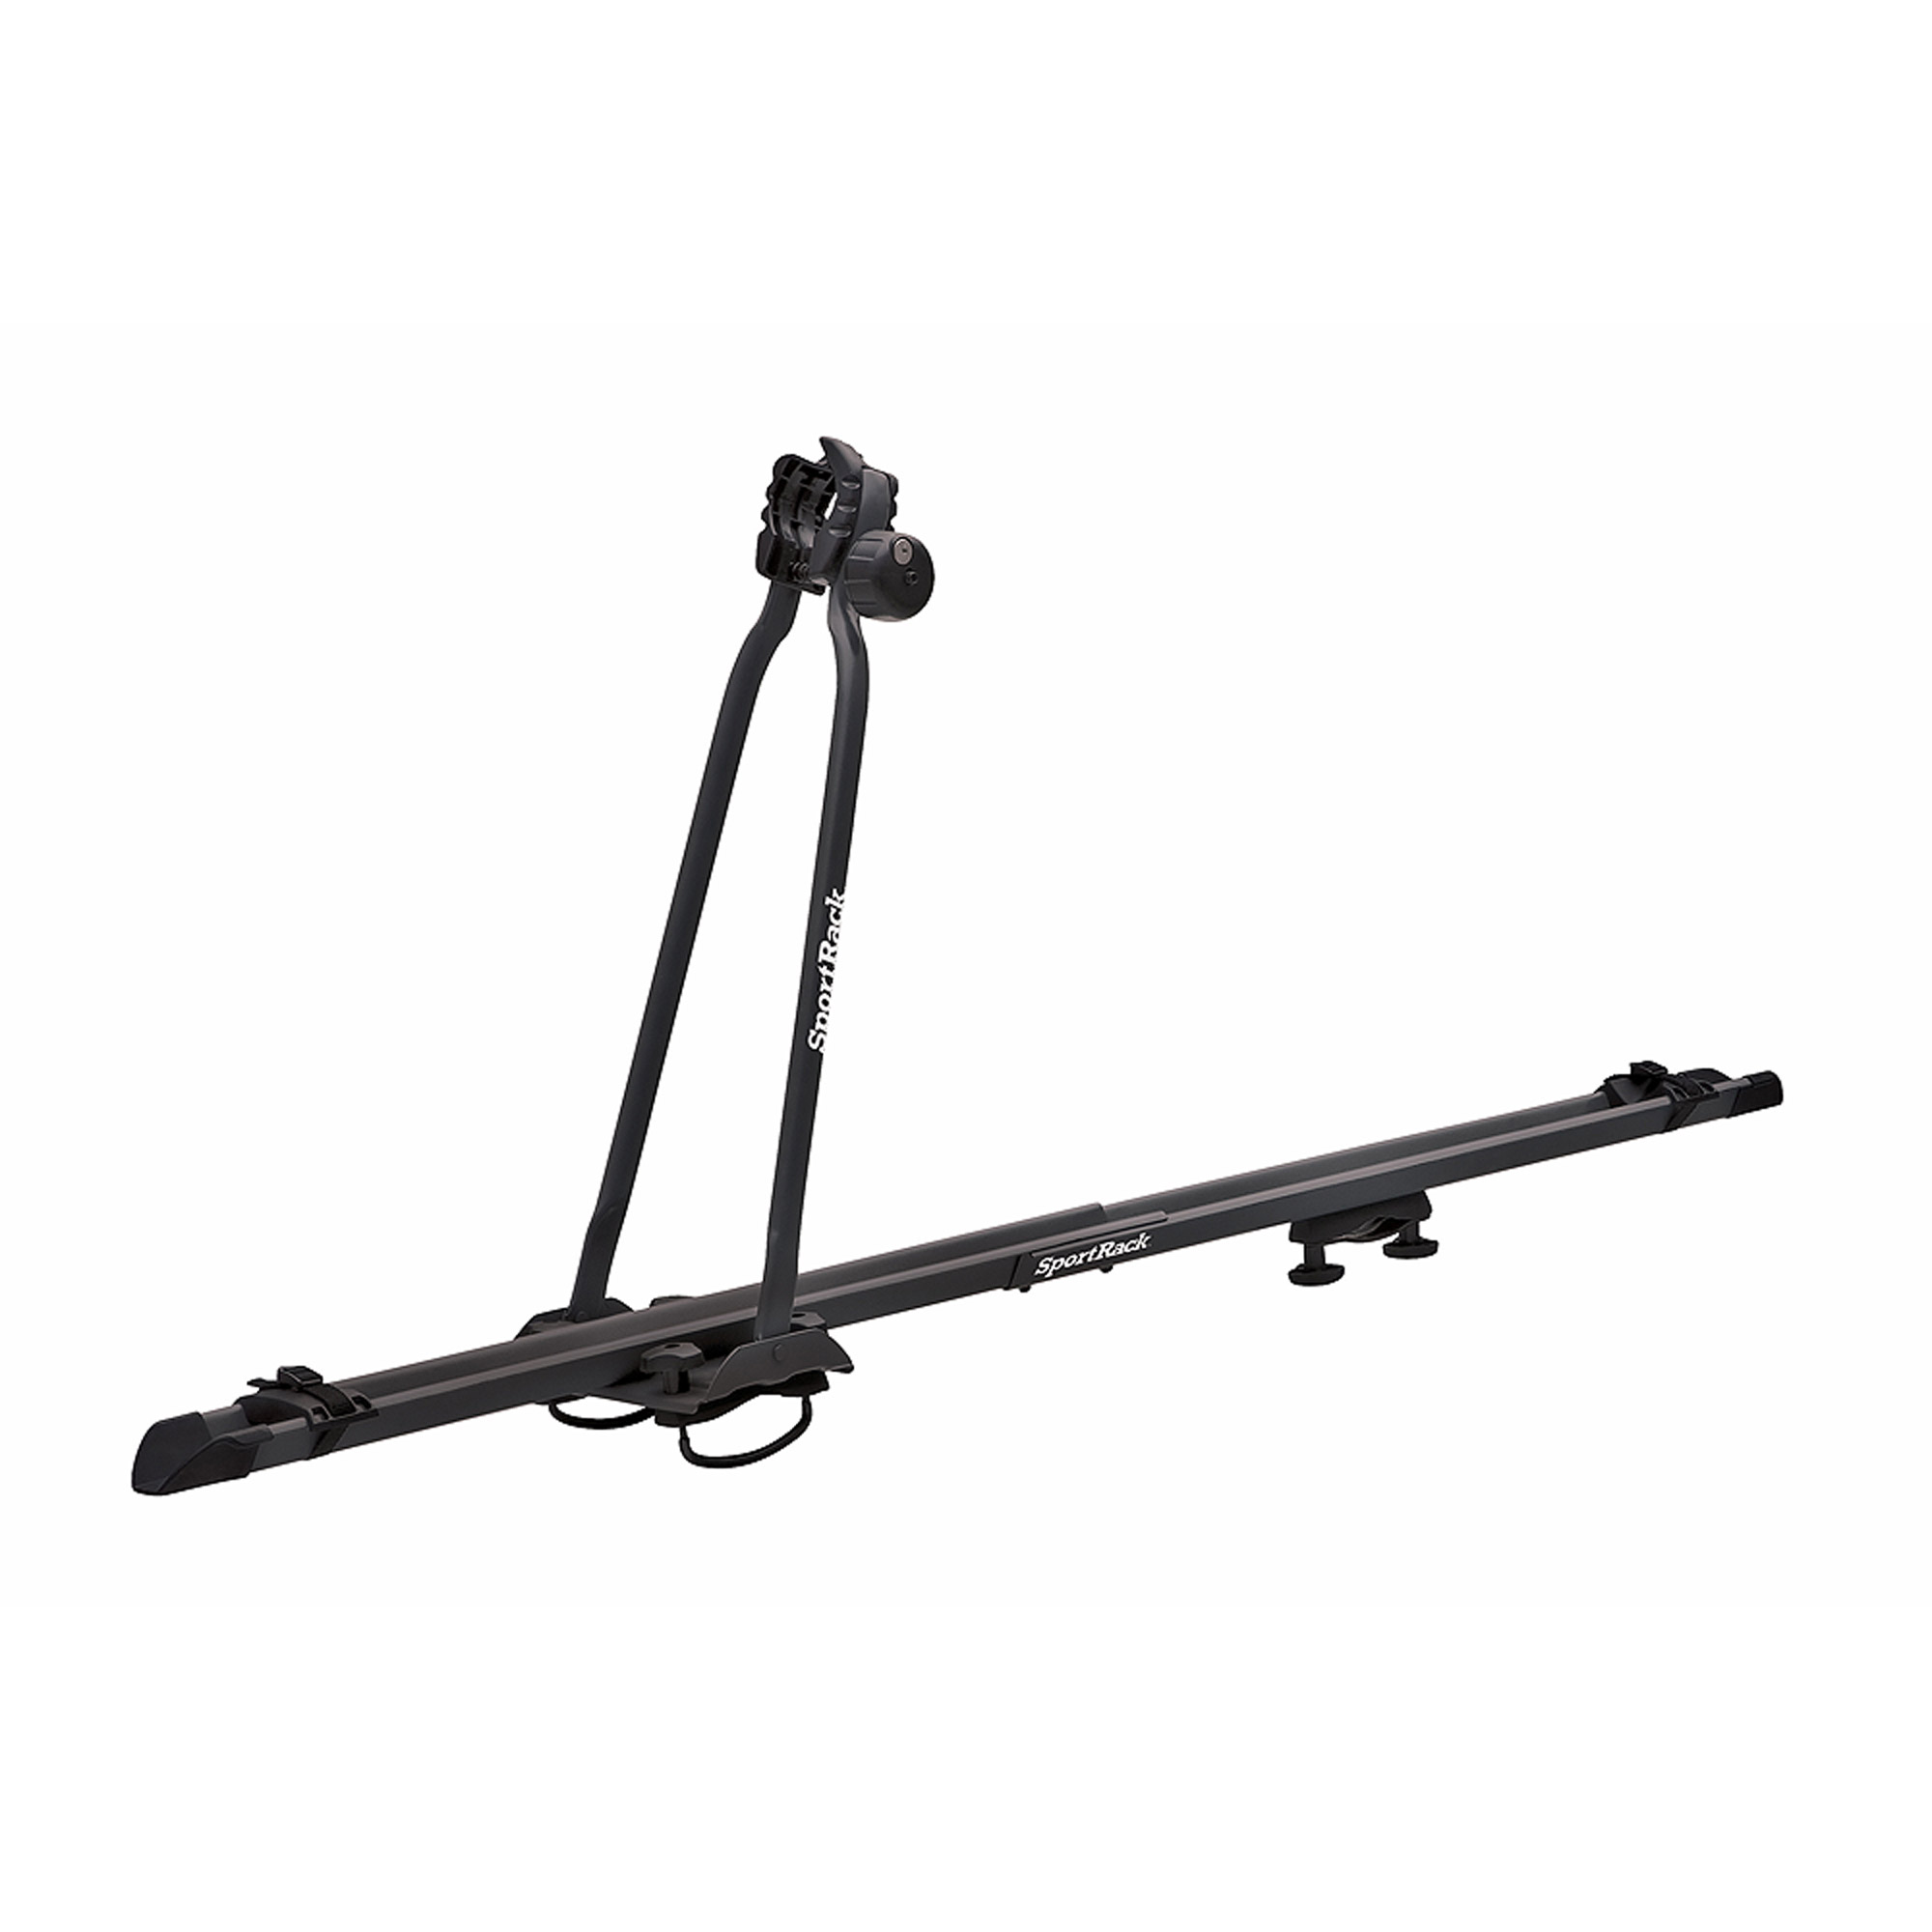 SportRack SR4883 Upshift Roof Bike Carrier, 1-Bike, Black by Thule